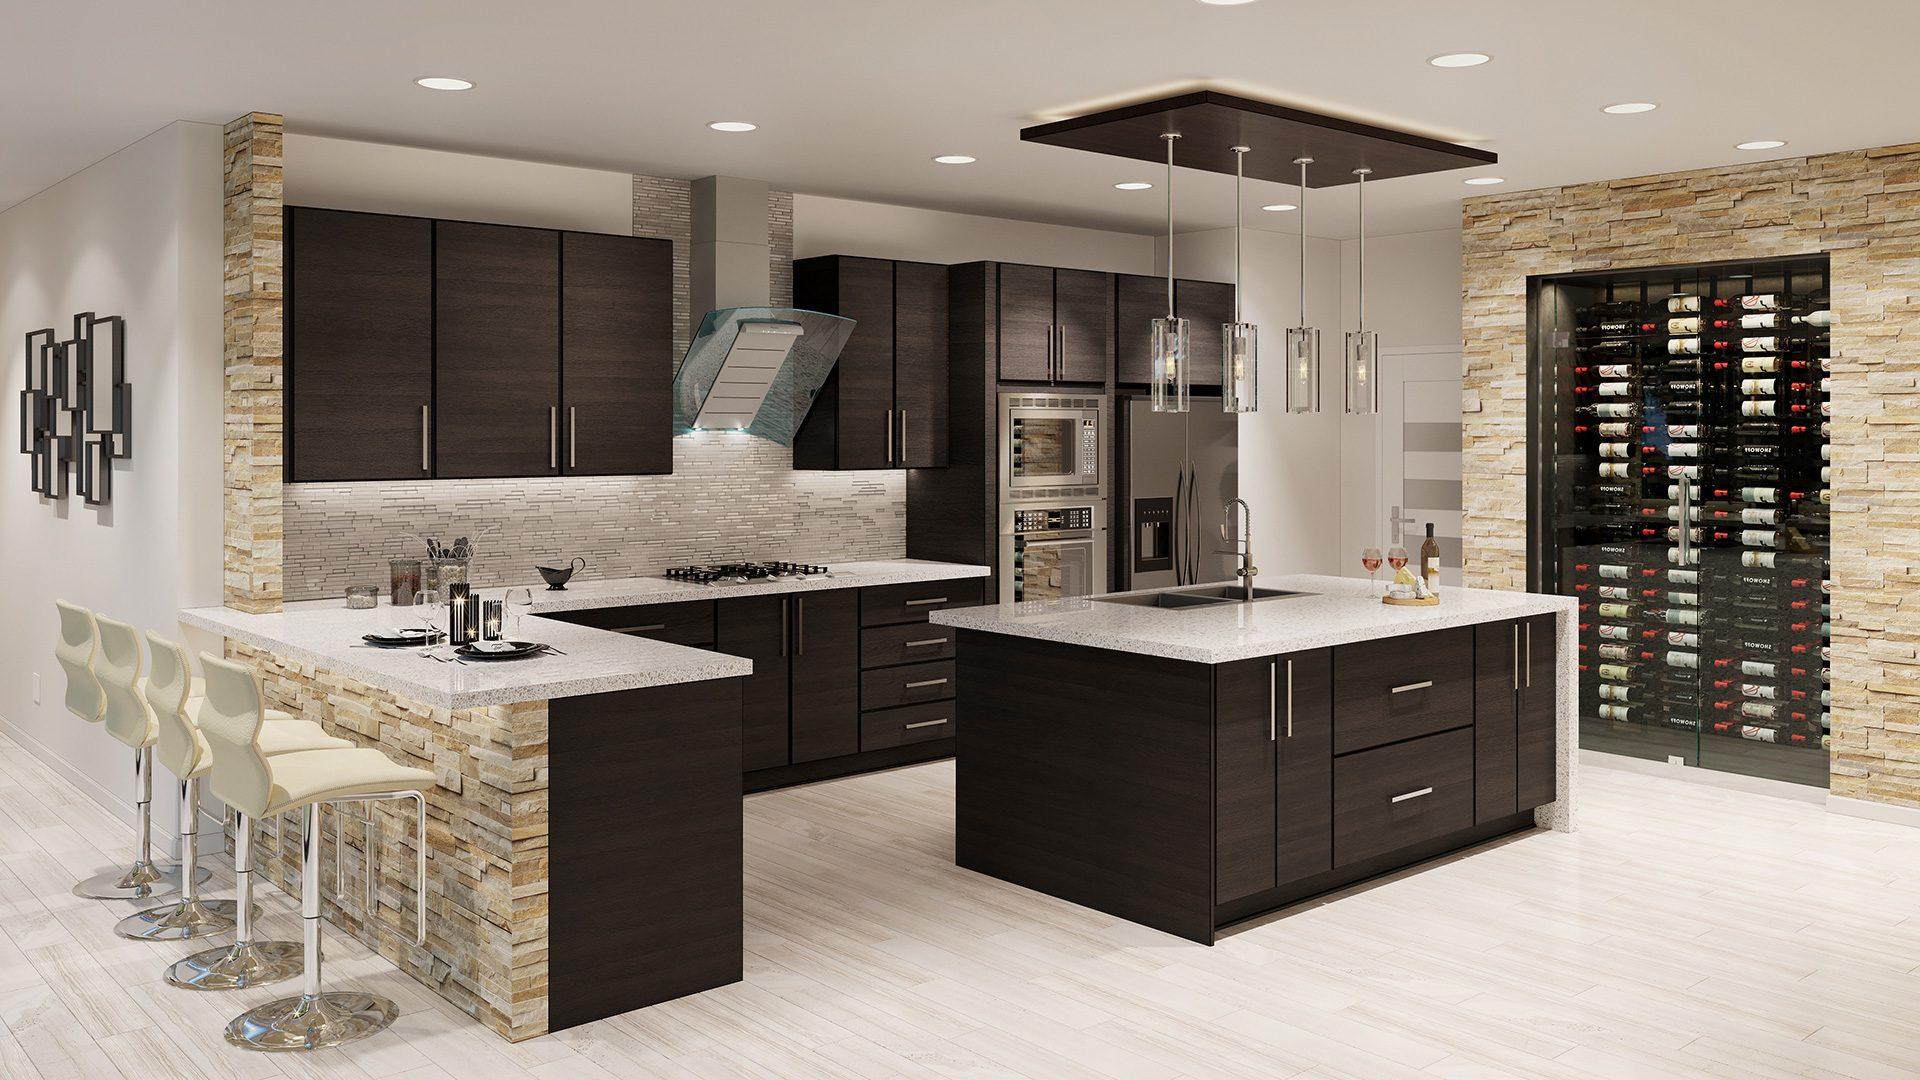 Flat-panel kitchen cabinets